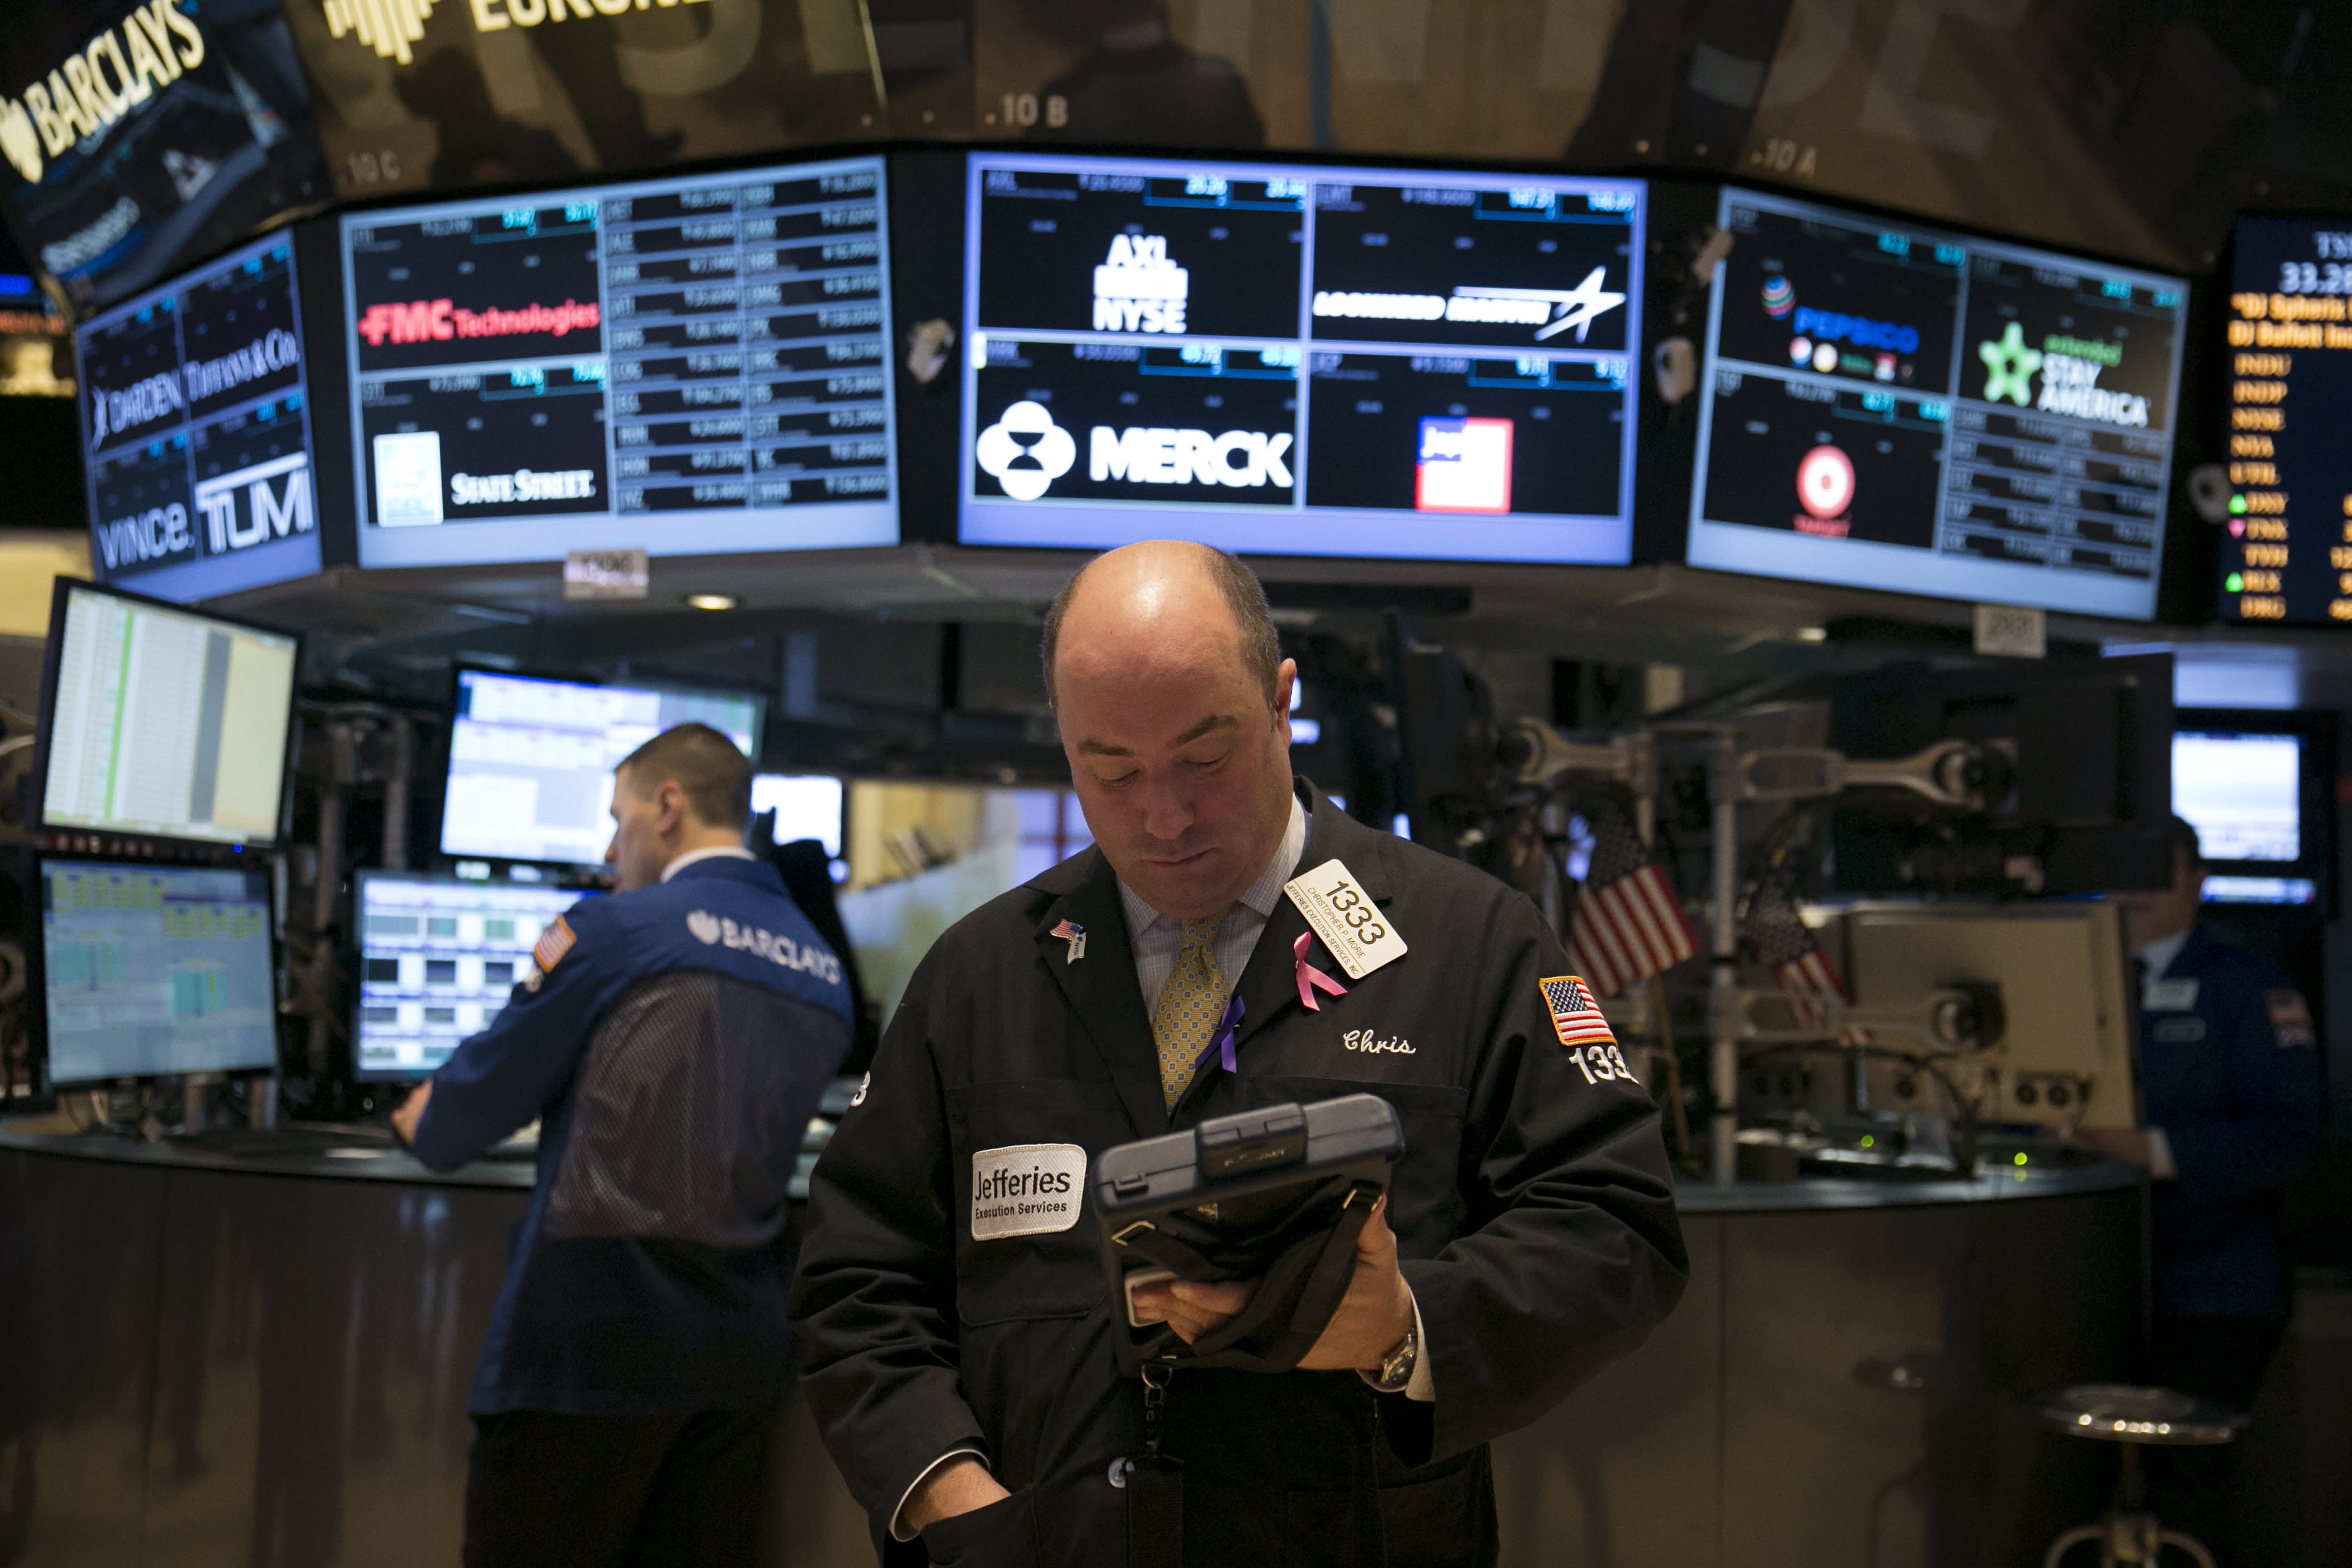 2-year Treasury yield hits 2008 highs as Gundlach watches